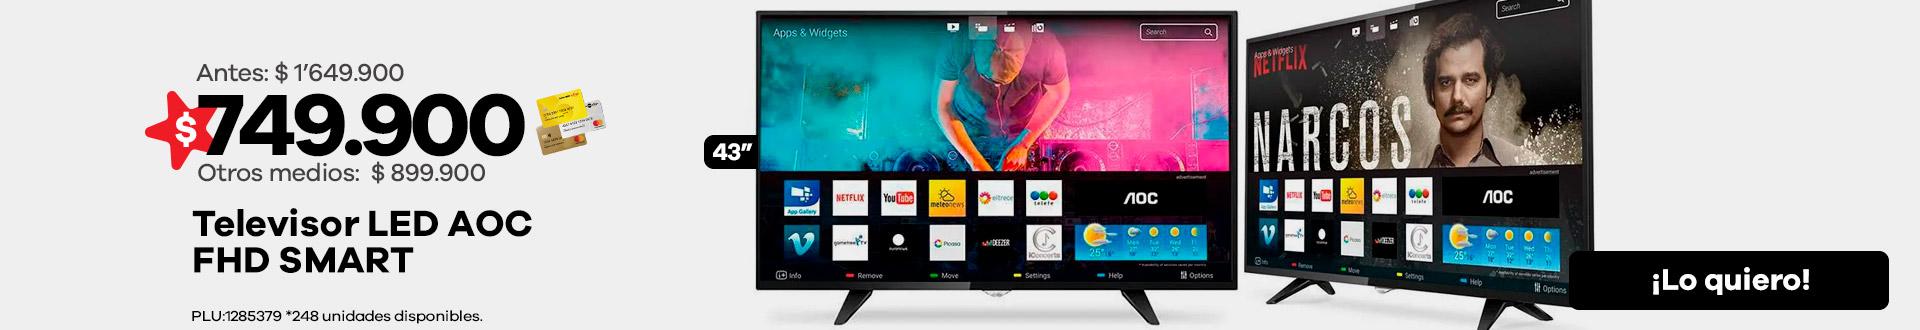 tv-led-107cms-43-fhd-smart-920082